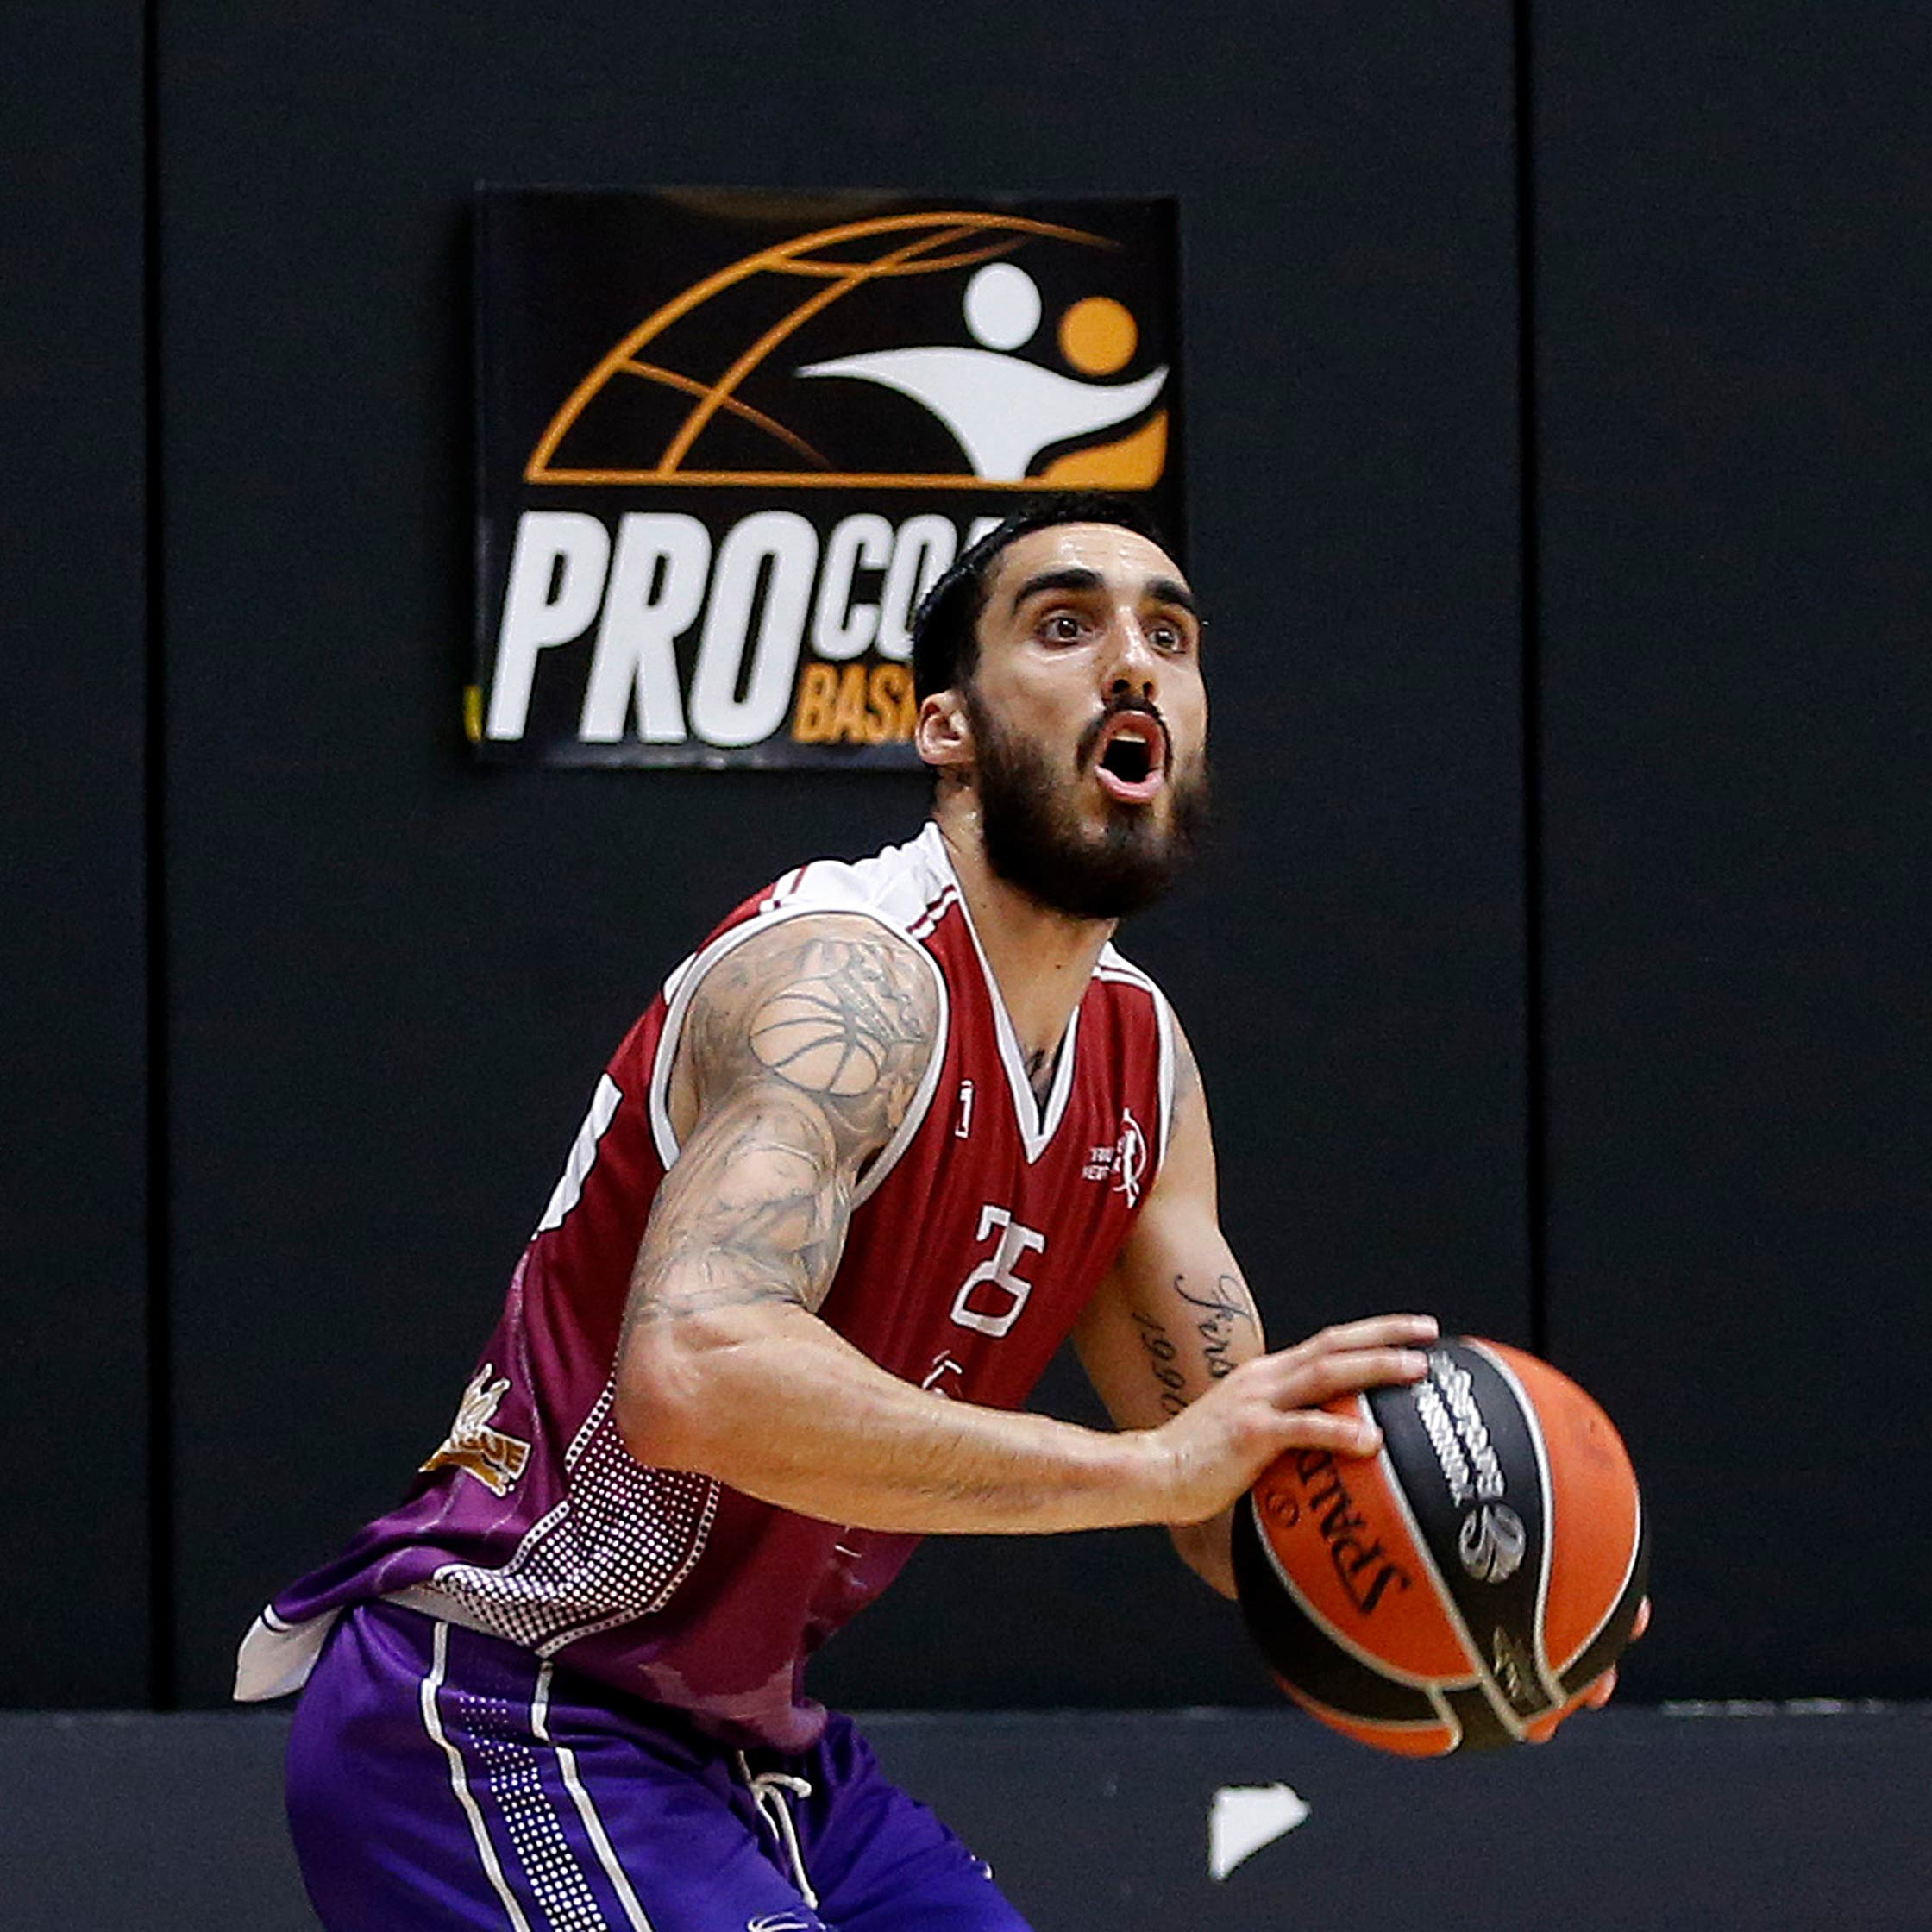 Jose Ramos EuroProBasket